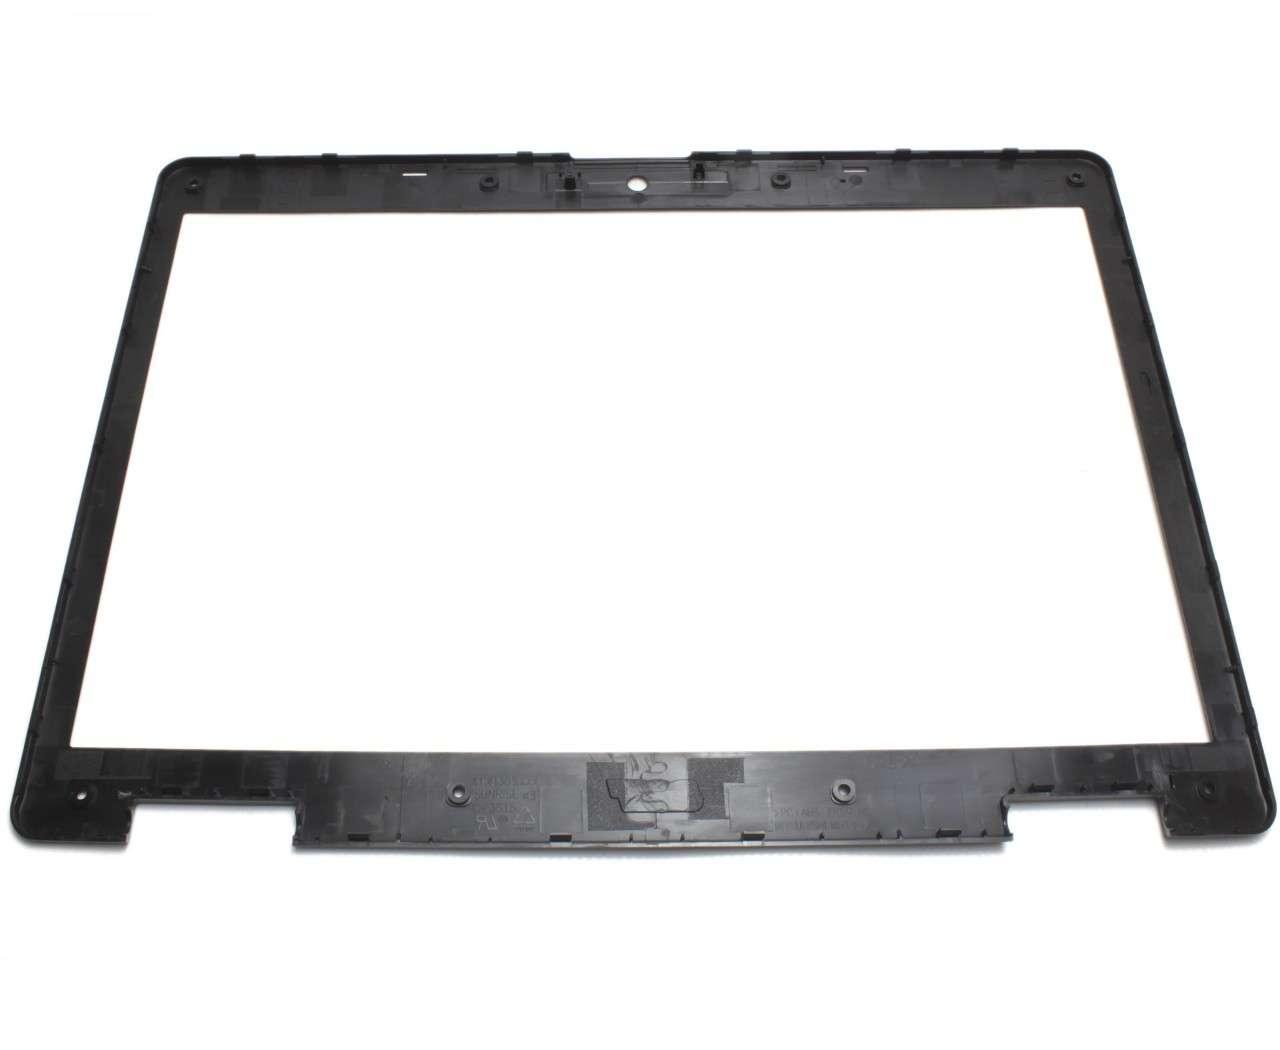 Rama Display Acer Extensa 5420 Bezel Front Cover Neagra imagine